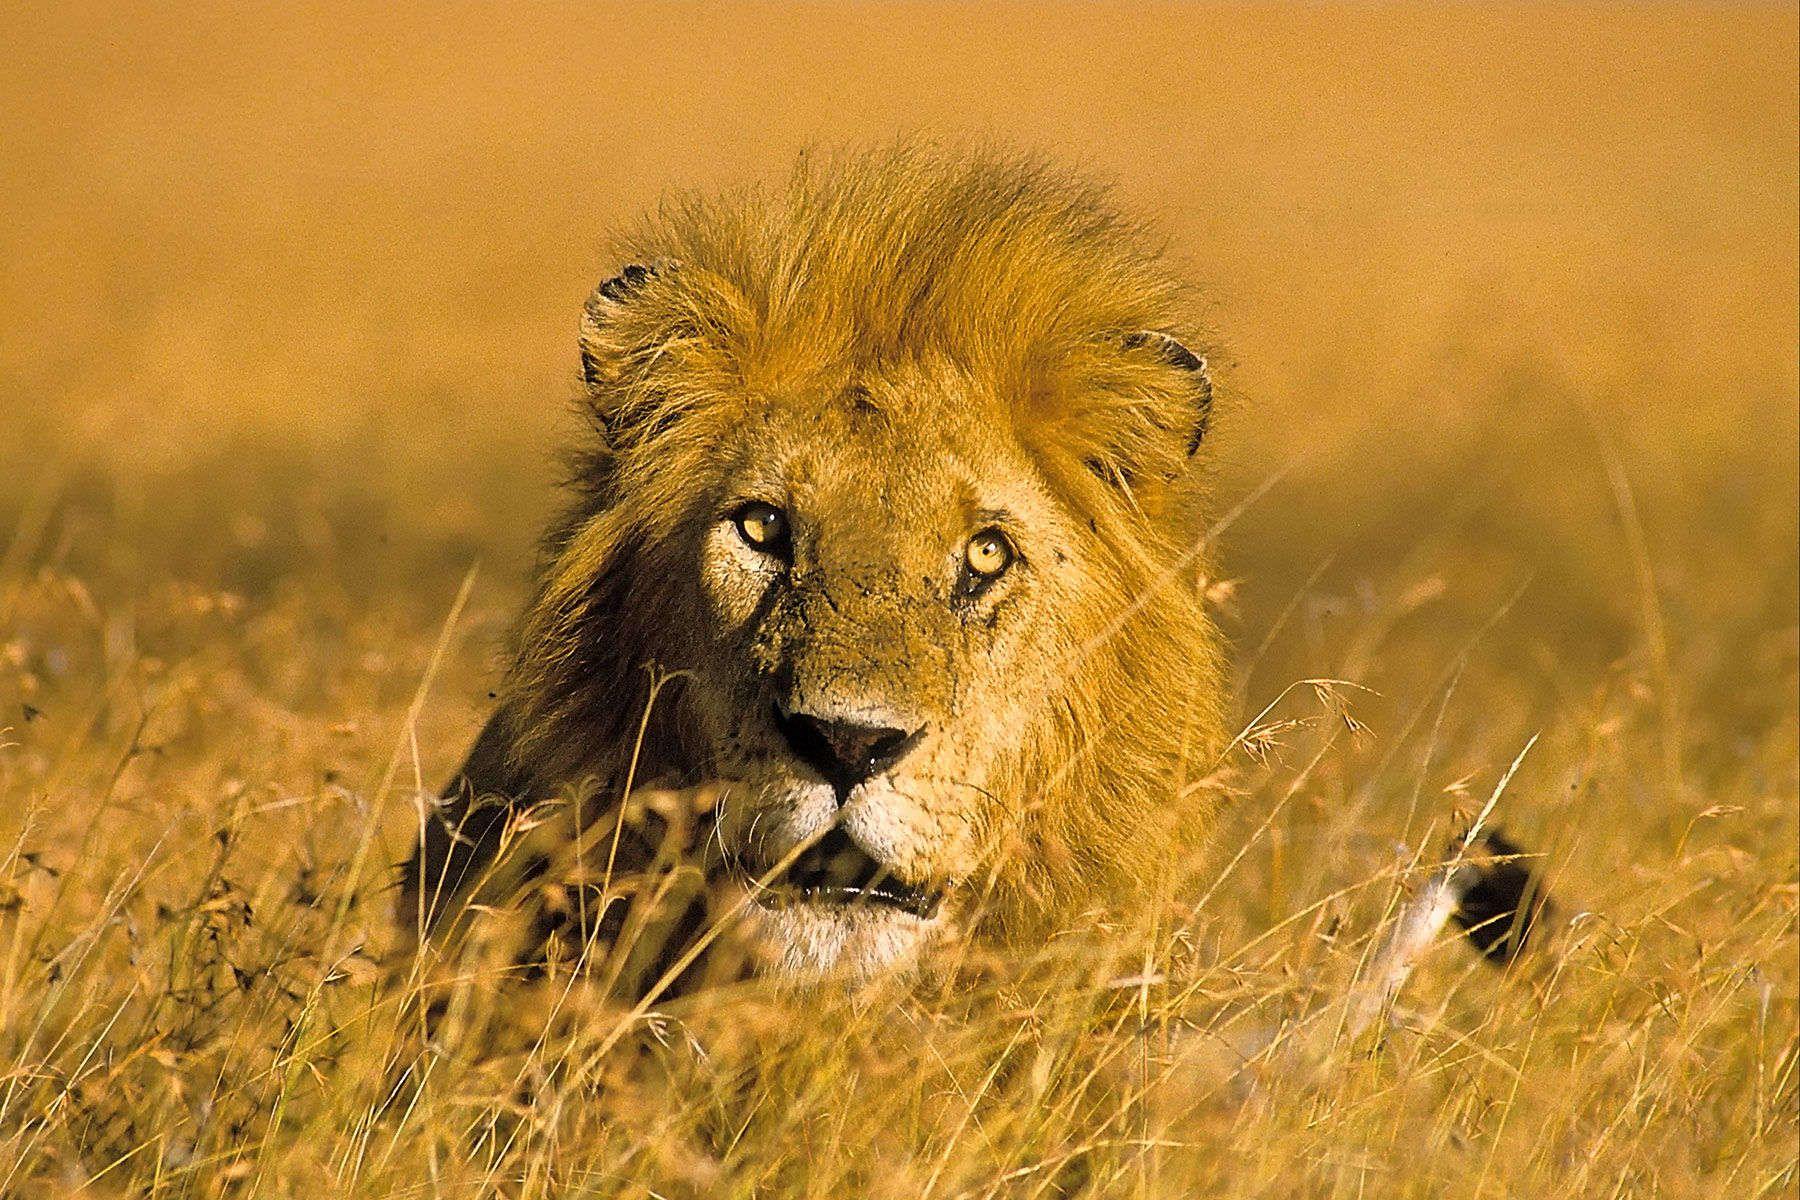 060614163514_10100_charging_lion_copy_cropped_1800x1200_web_600kb.jpg